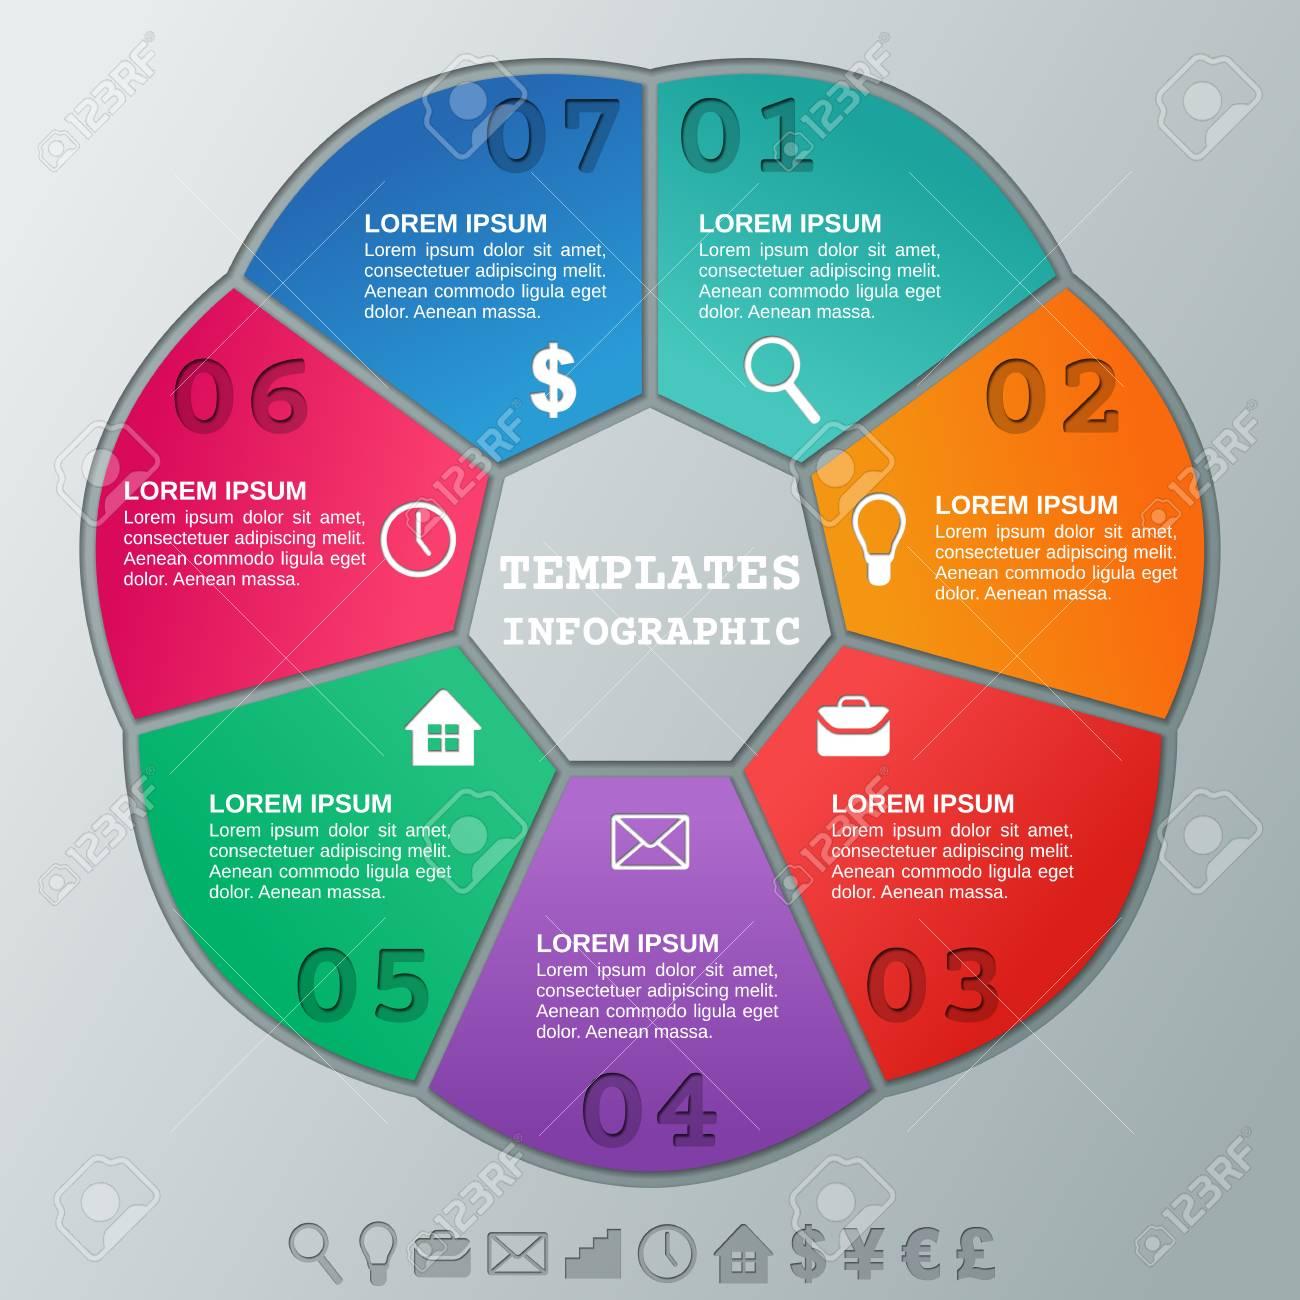 Elementos De Infografía Plantilla Circular Infografía. Marcos De ...